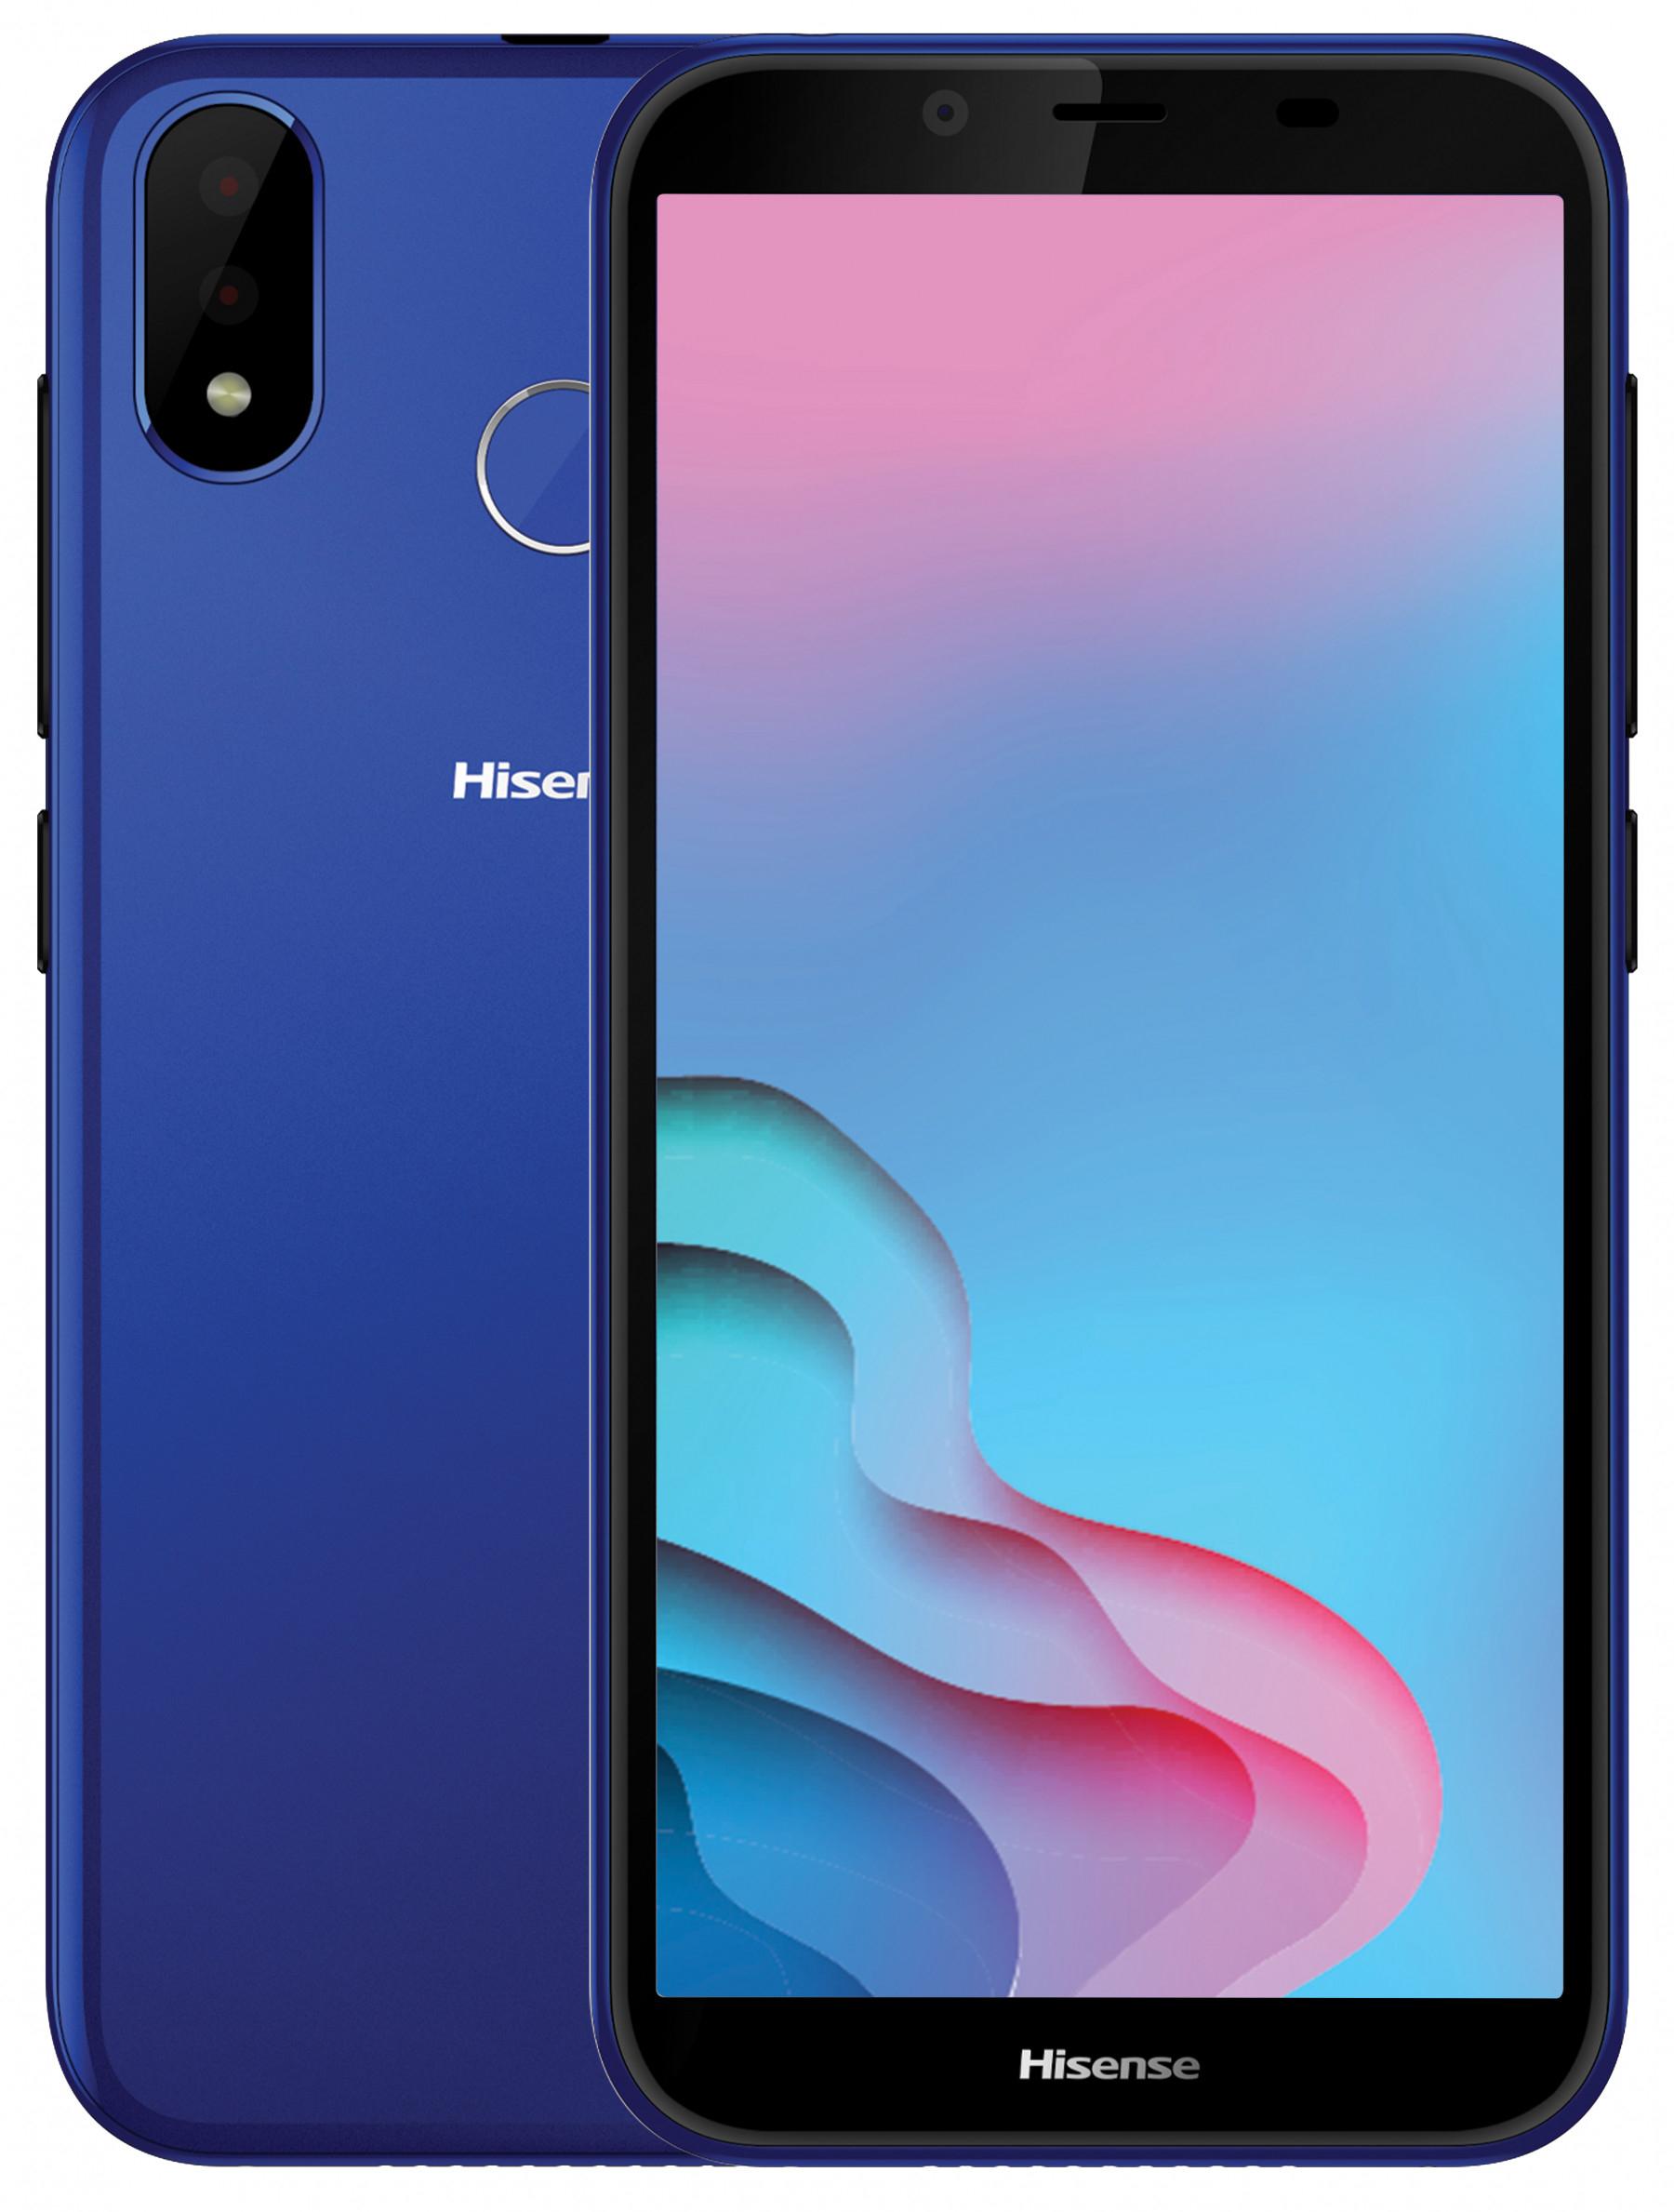 "Smartphone 5.7"" Hisense Infinity E9 - HD+, MT6739, RAM 2 Go, 16 Go, 13+2 MP, Capteur d'empreintes, Face Unlock (Bleu ou Or) - Via ODR de 40€"